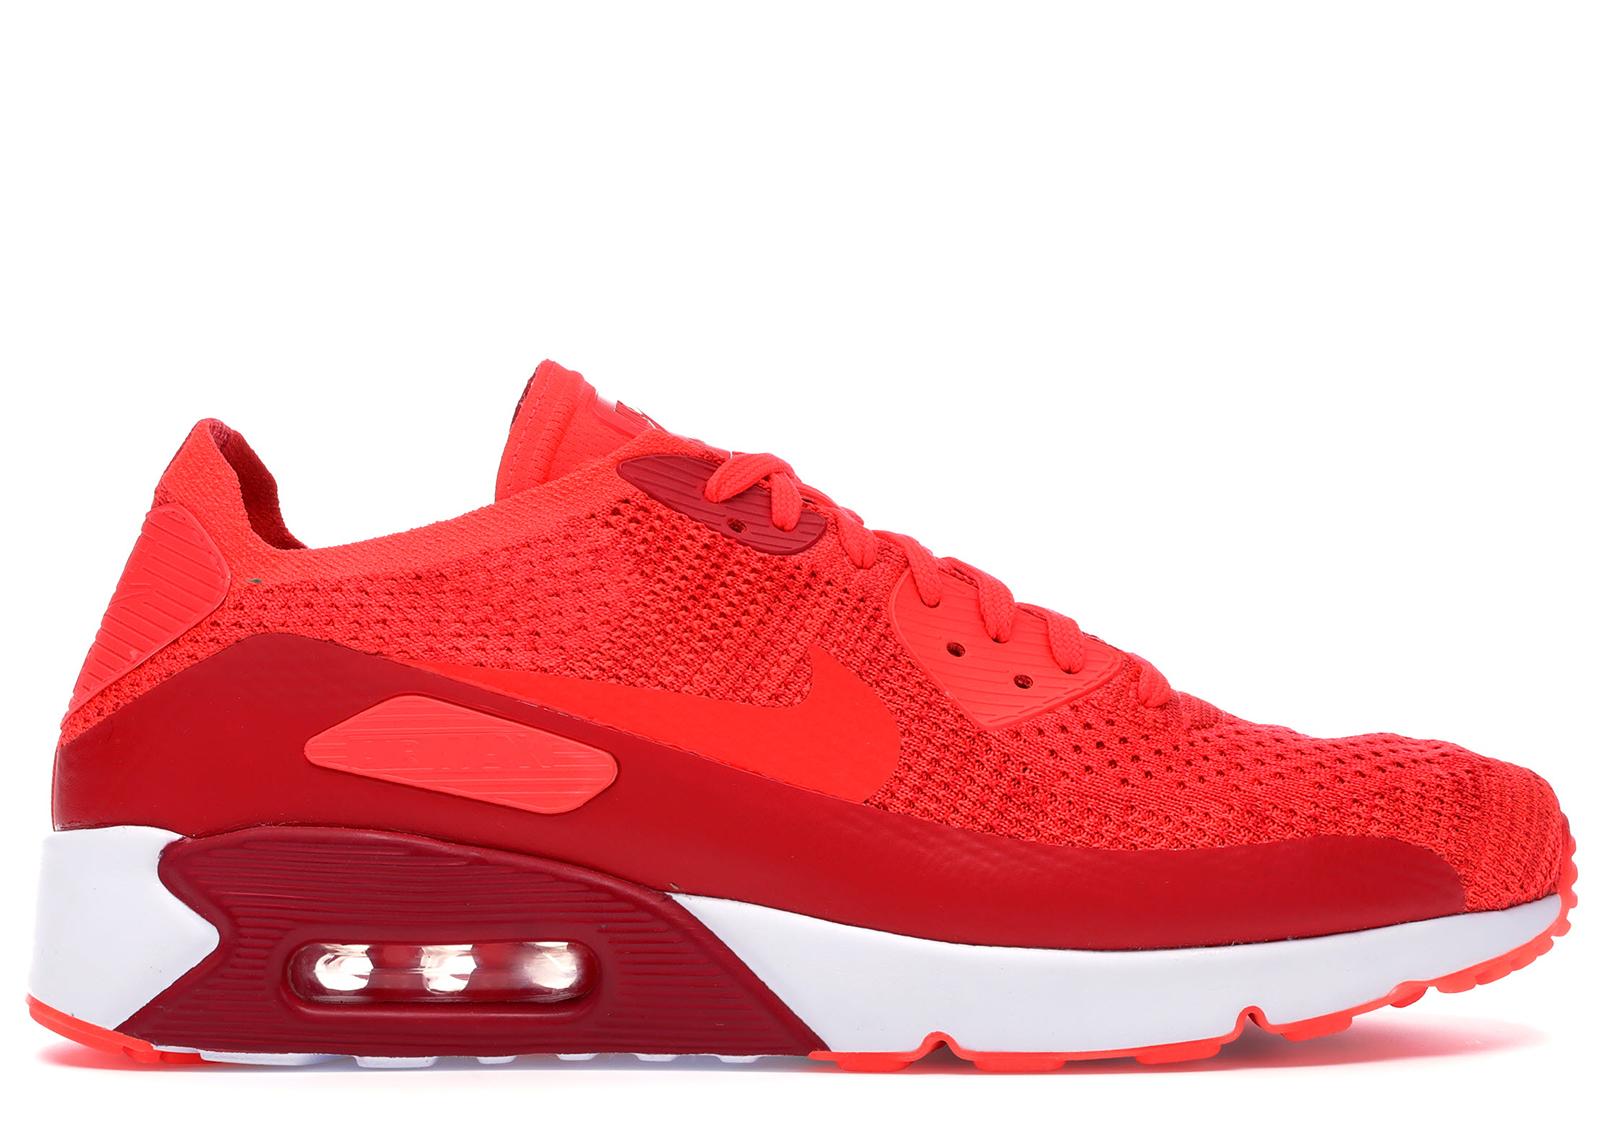 Nike Air Max 90 Schuhe Beliebtesten